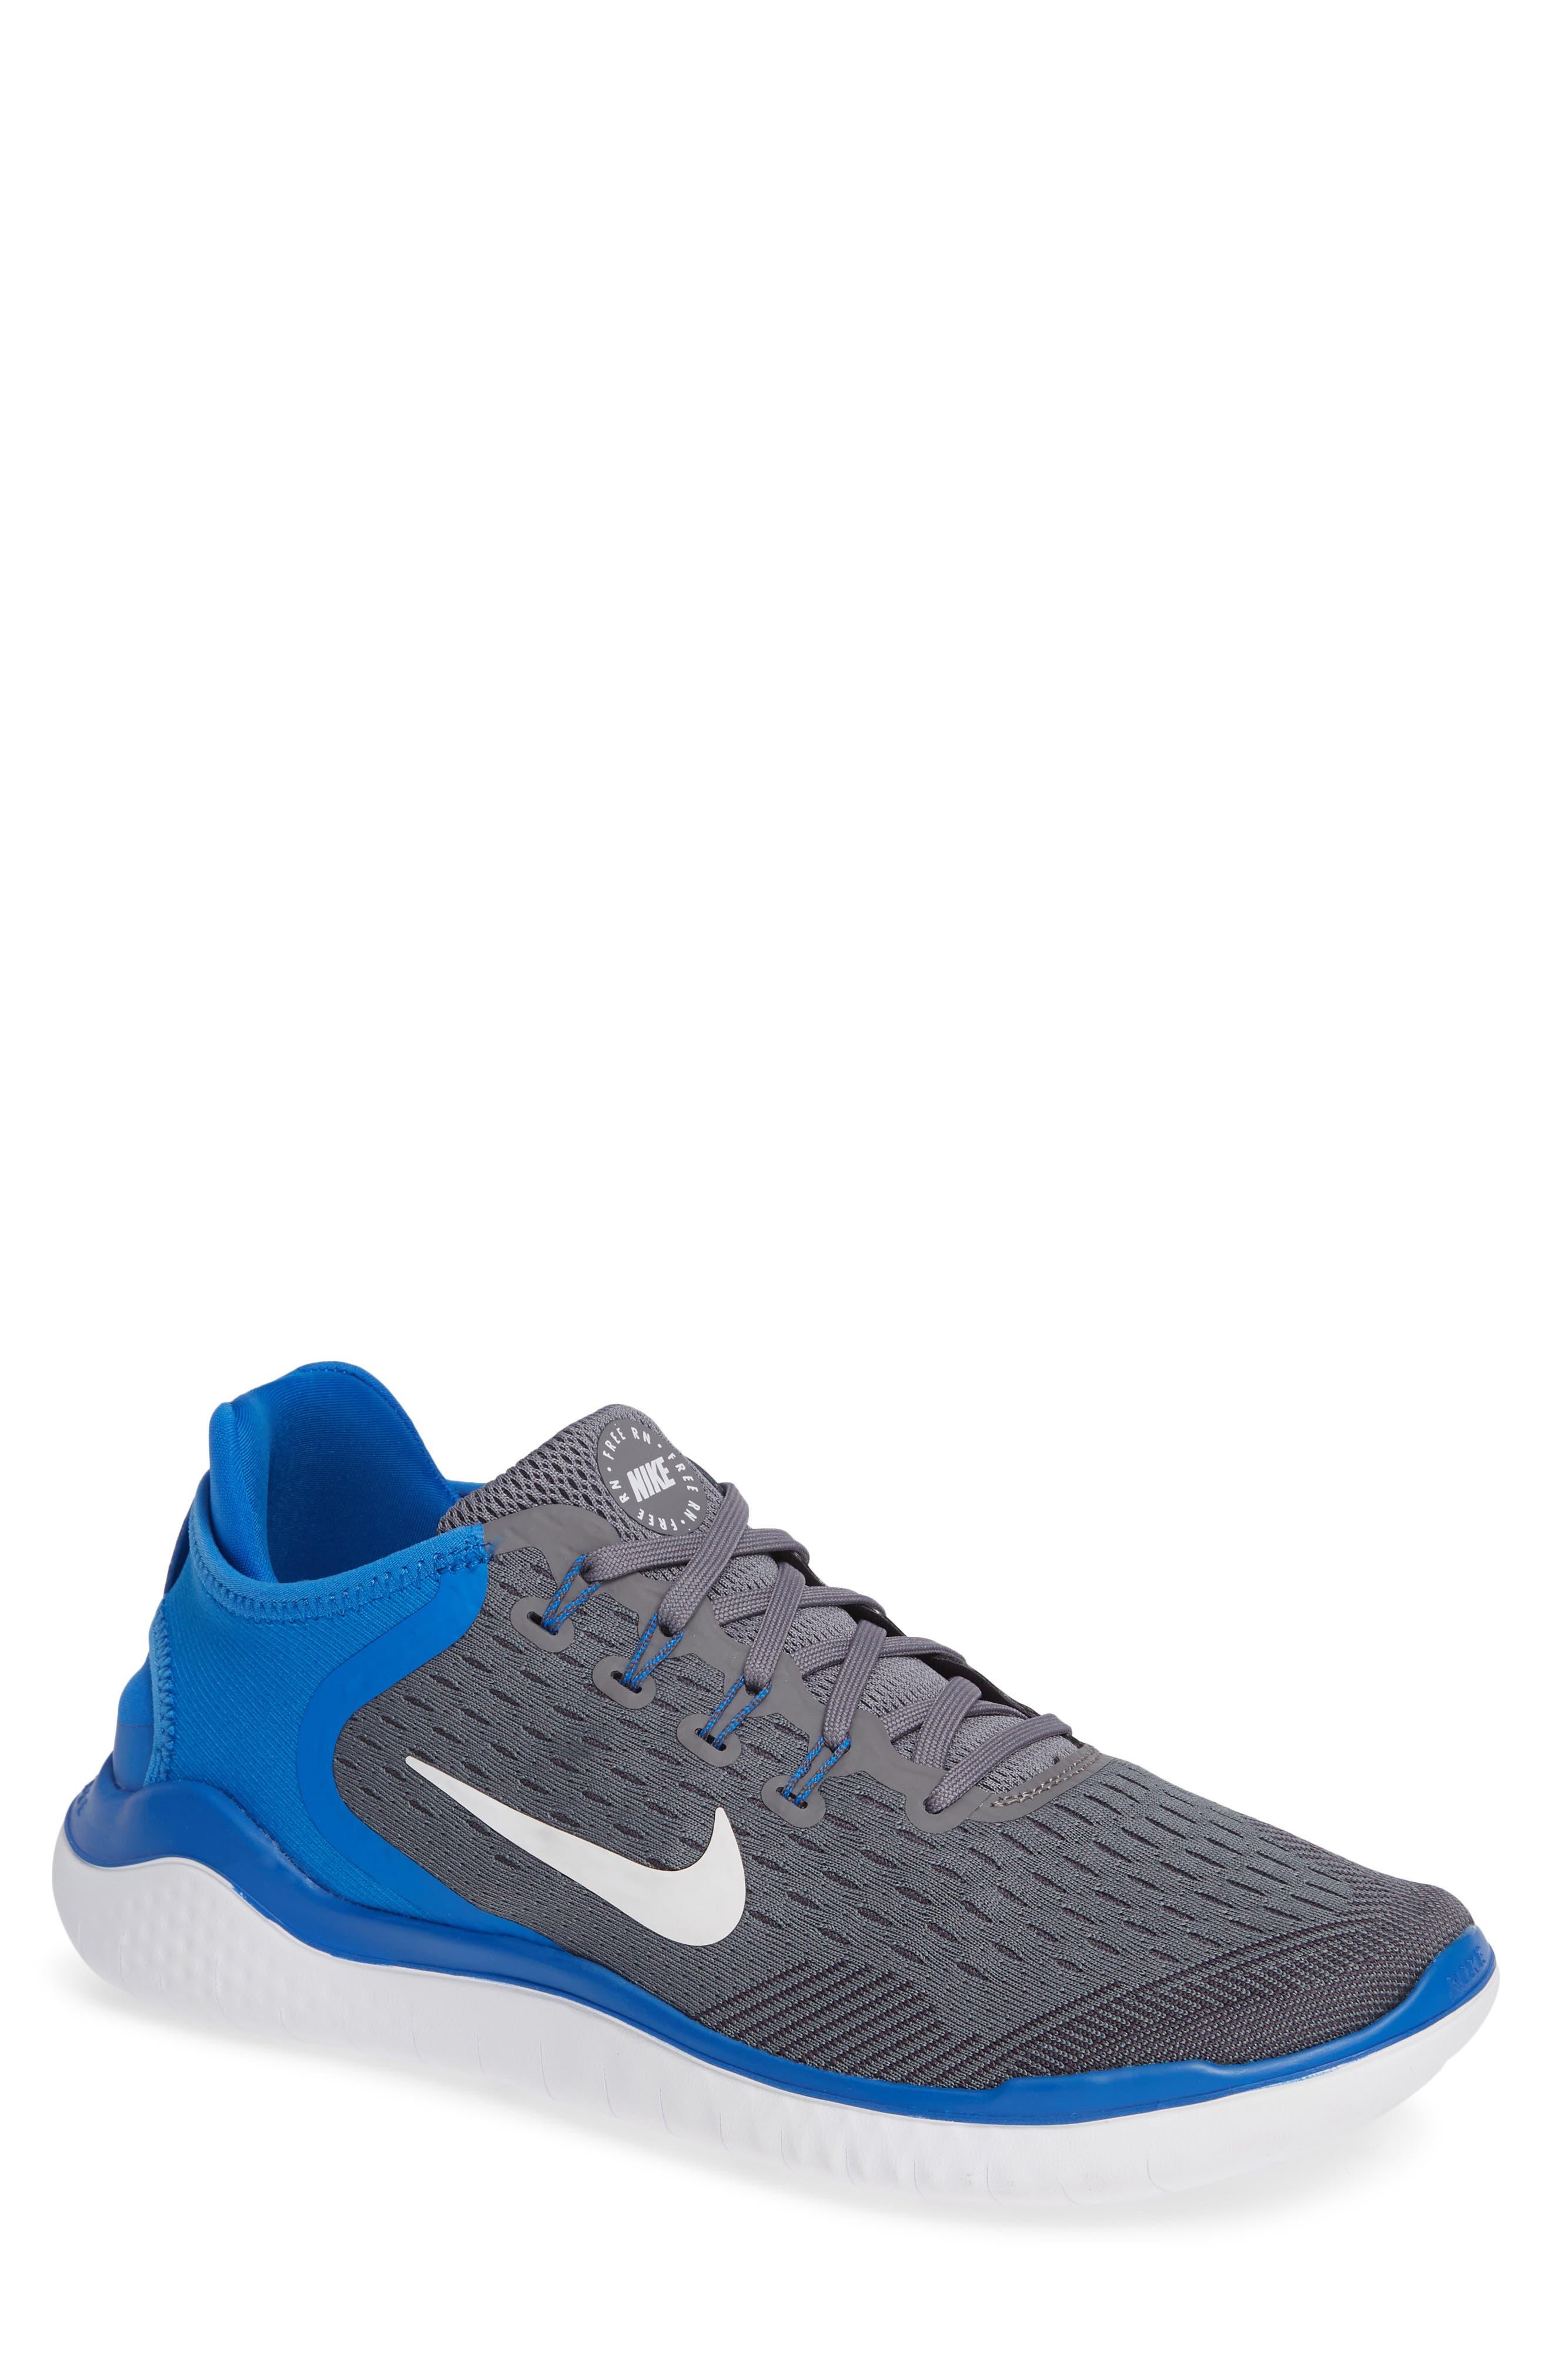 Free RN 2018 Running Shoe,                             Main thumbnail 1, color,                             Gunsmoke/ White/ Blue